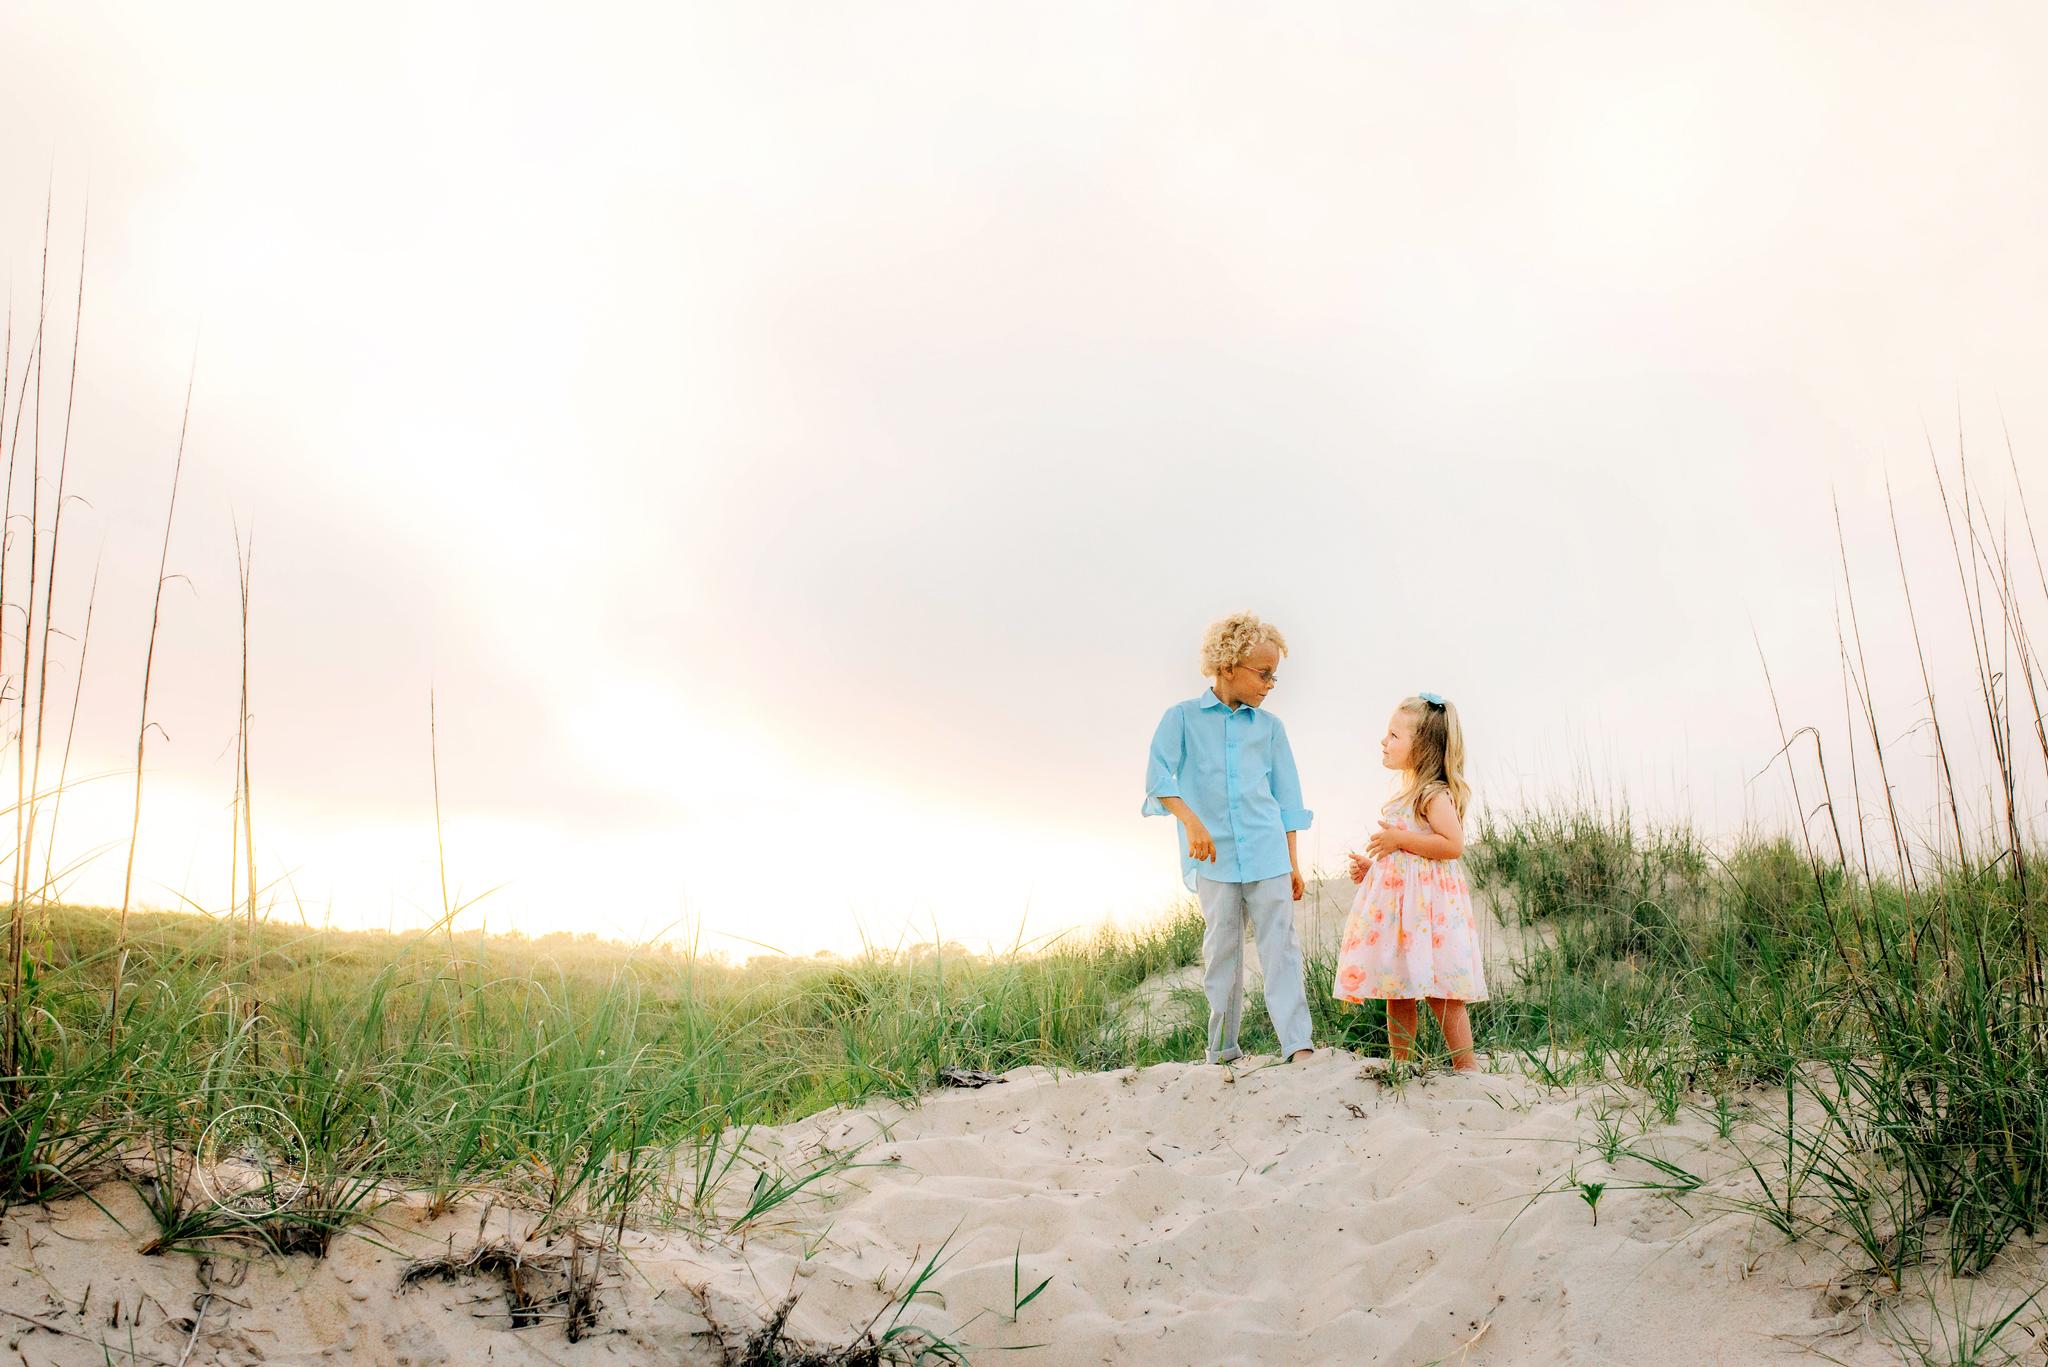 virginia-beach-sandbridge-beach-child-and-family-photographer-melissa-bliss-photography-kids-on-dunes.jpg